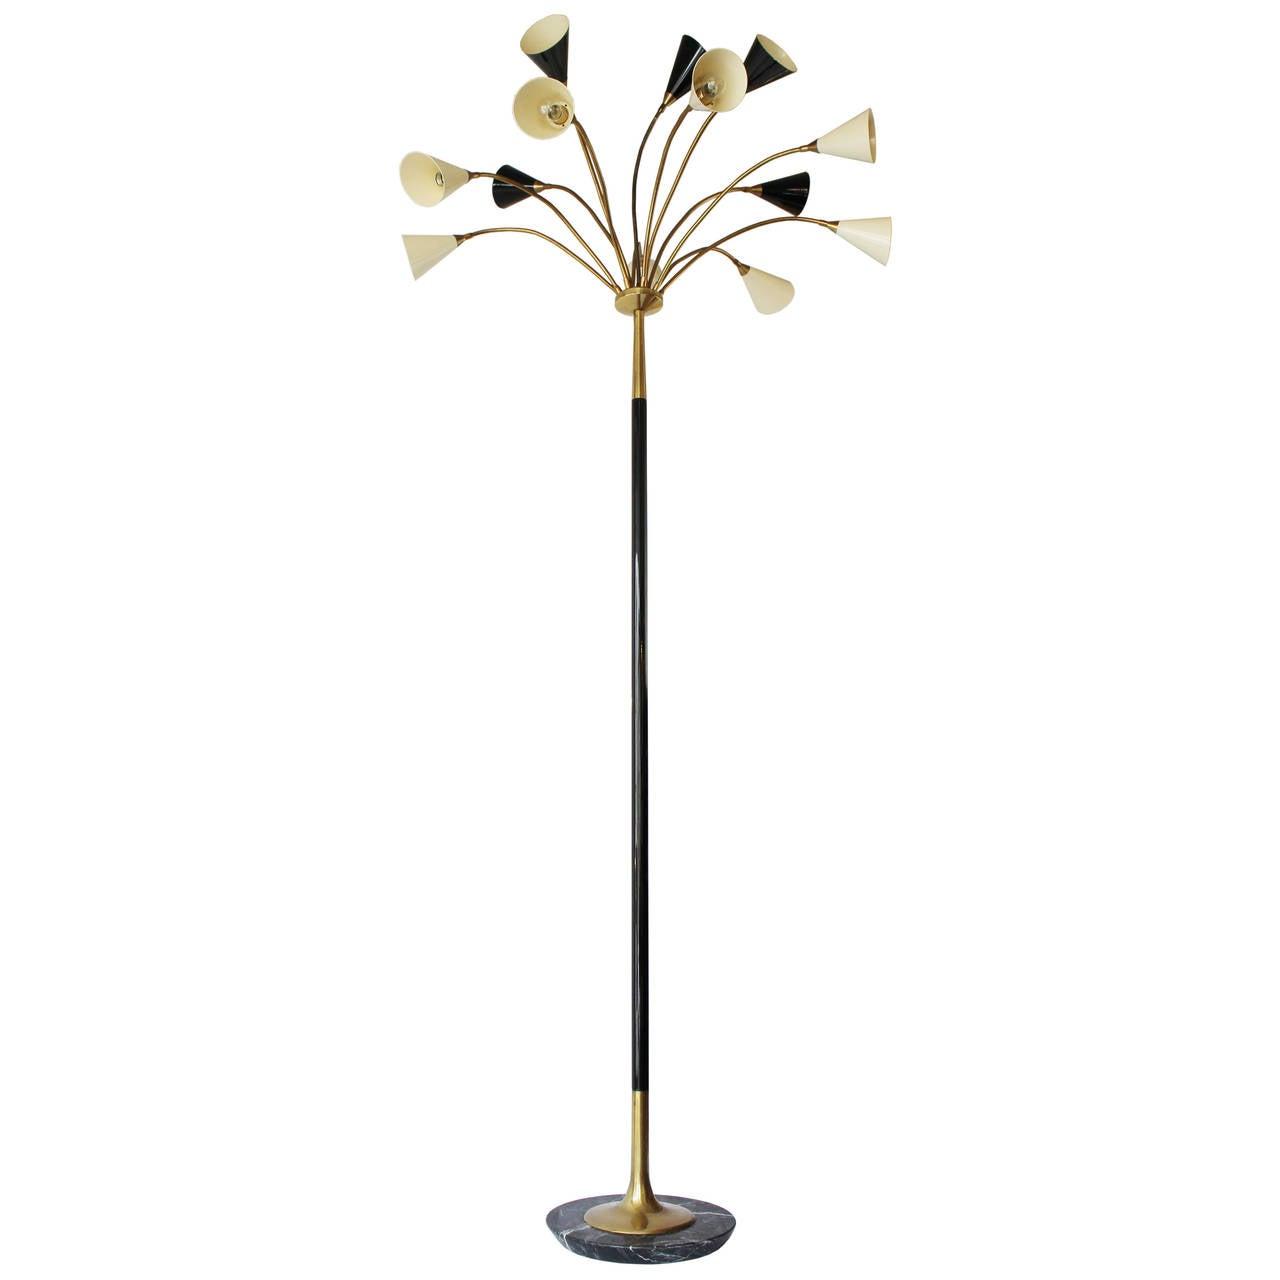 Arteluce Floor Lamp